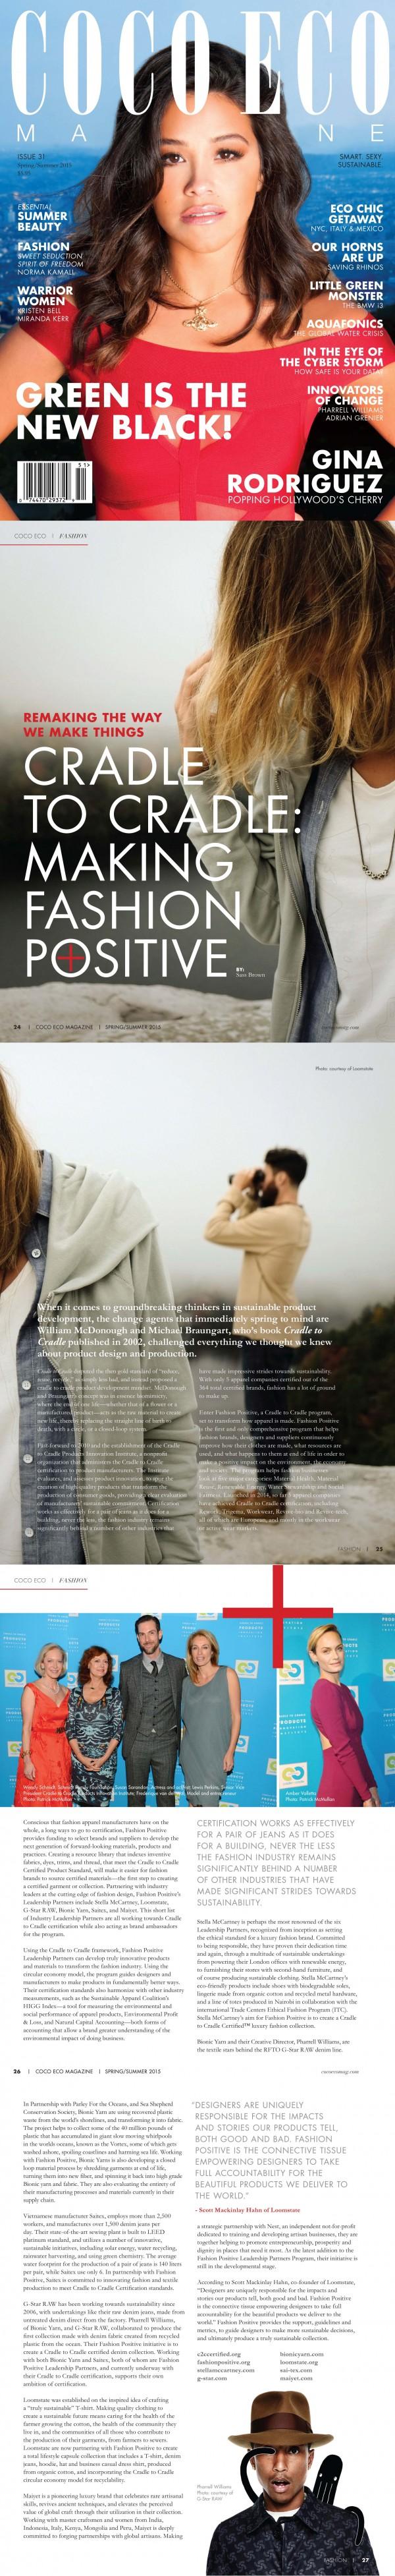 CocoEcoMagazine1May15Smallest